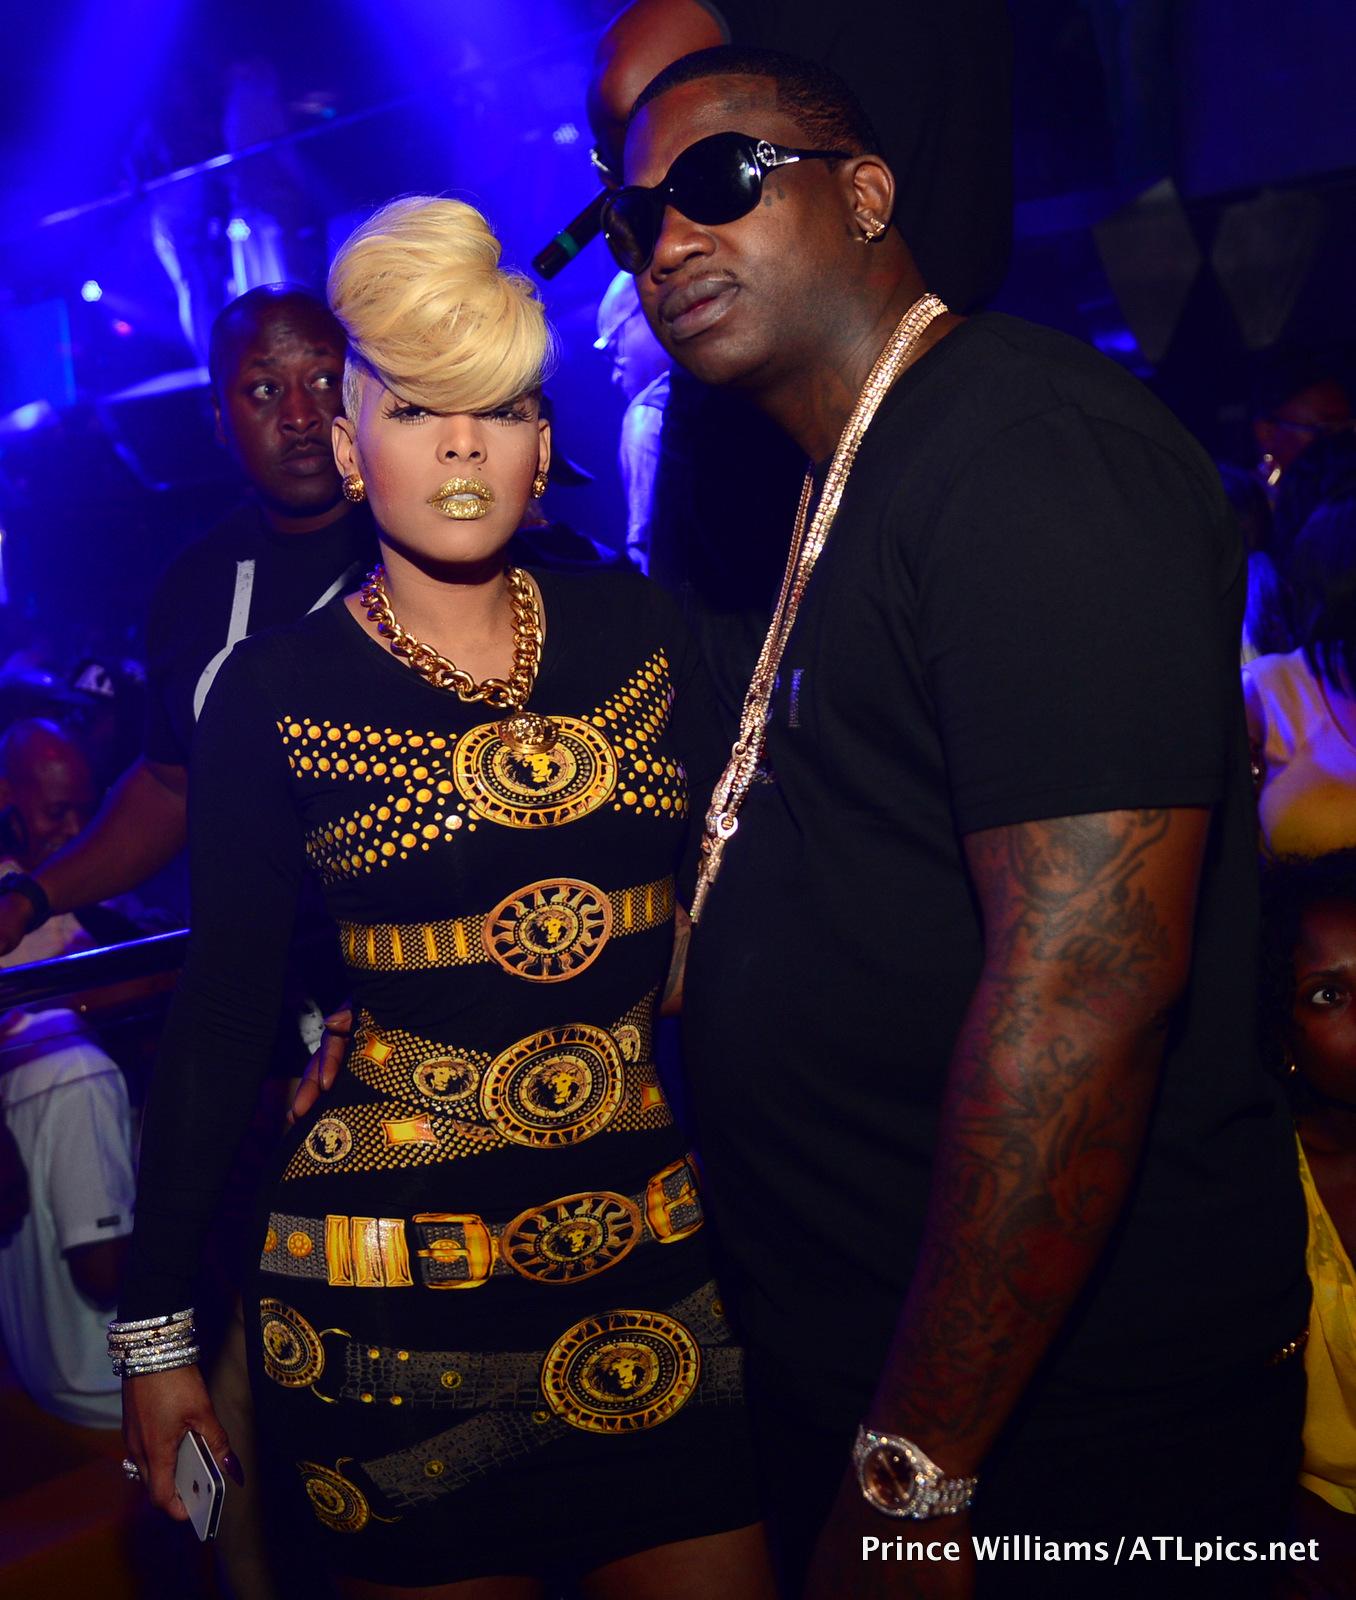 Chris Brown Goes Clubbin' In NYC, Lil Kim & Tiffany Foxx ...